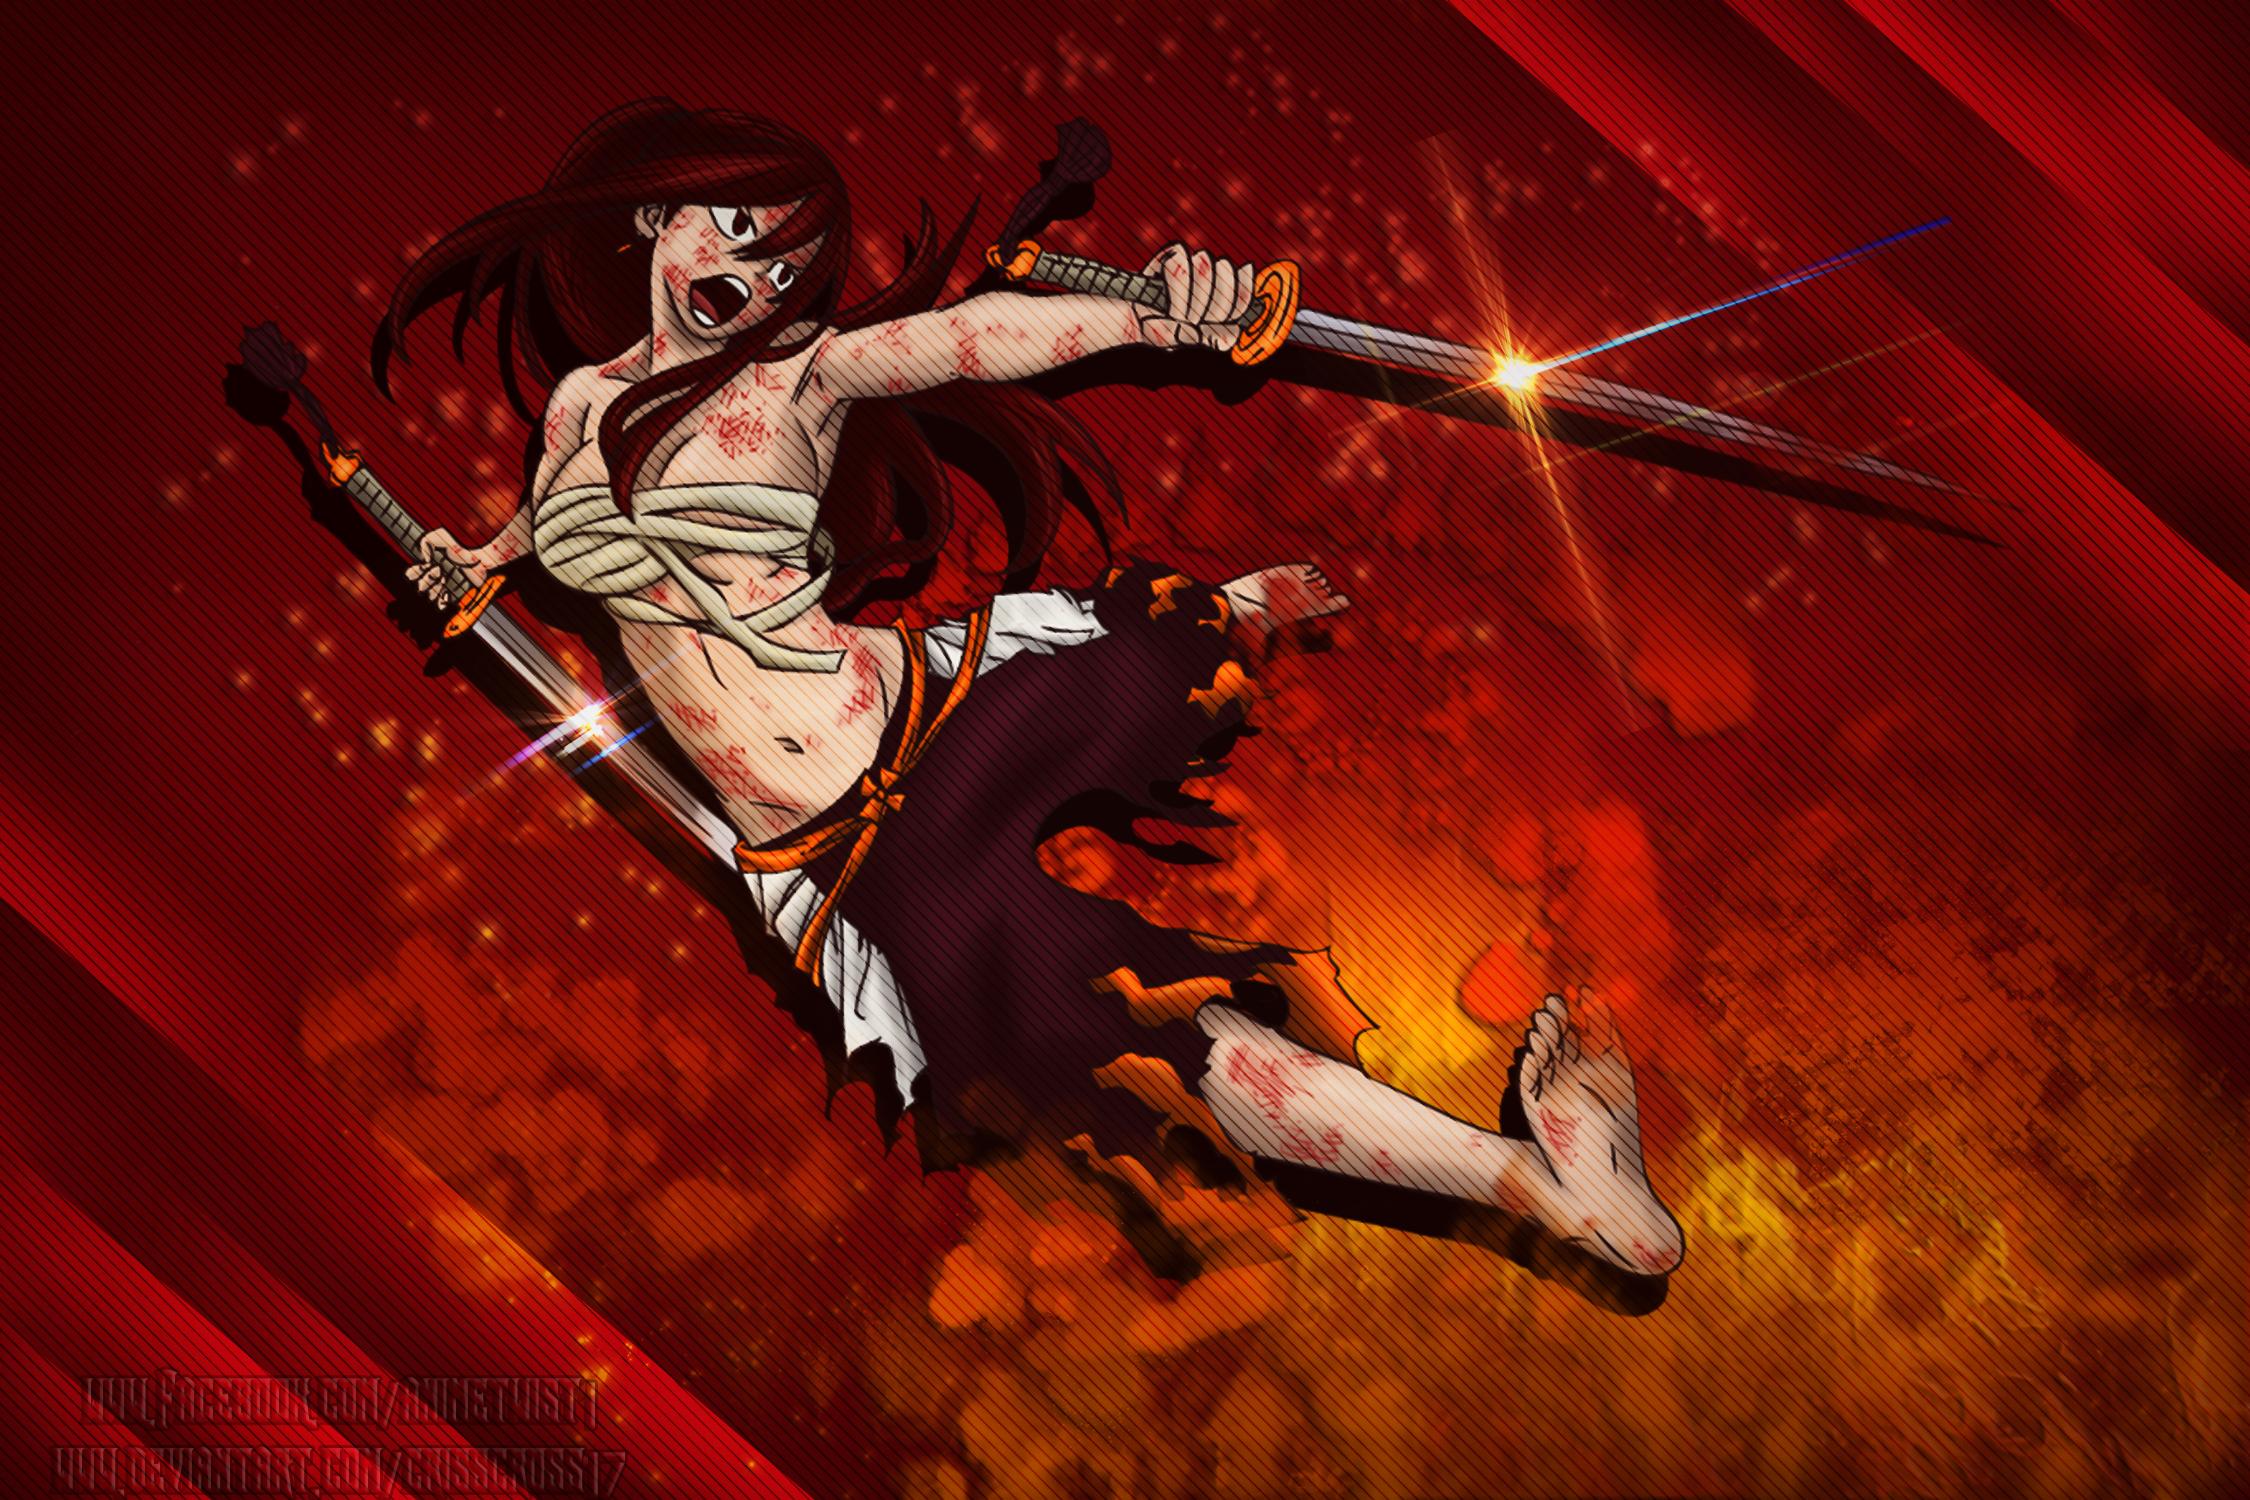 Erza Scarlet [Fairy Tail] Wallpaper by Crisscross17 on 2250x1500